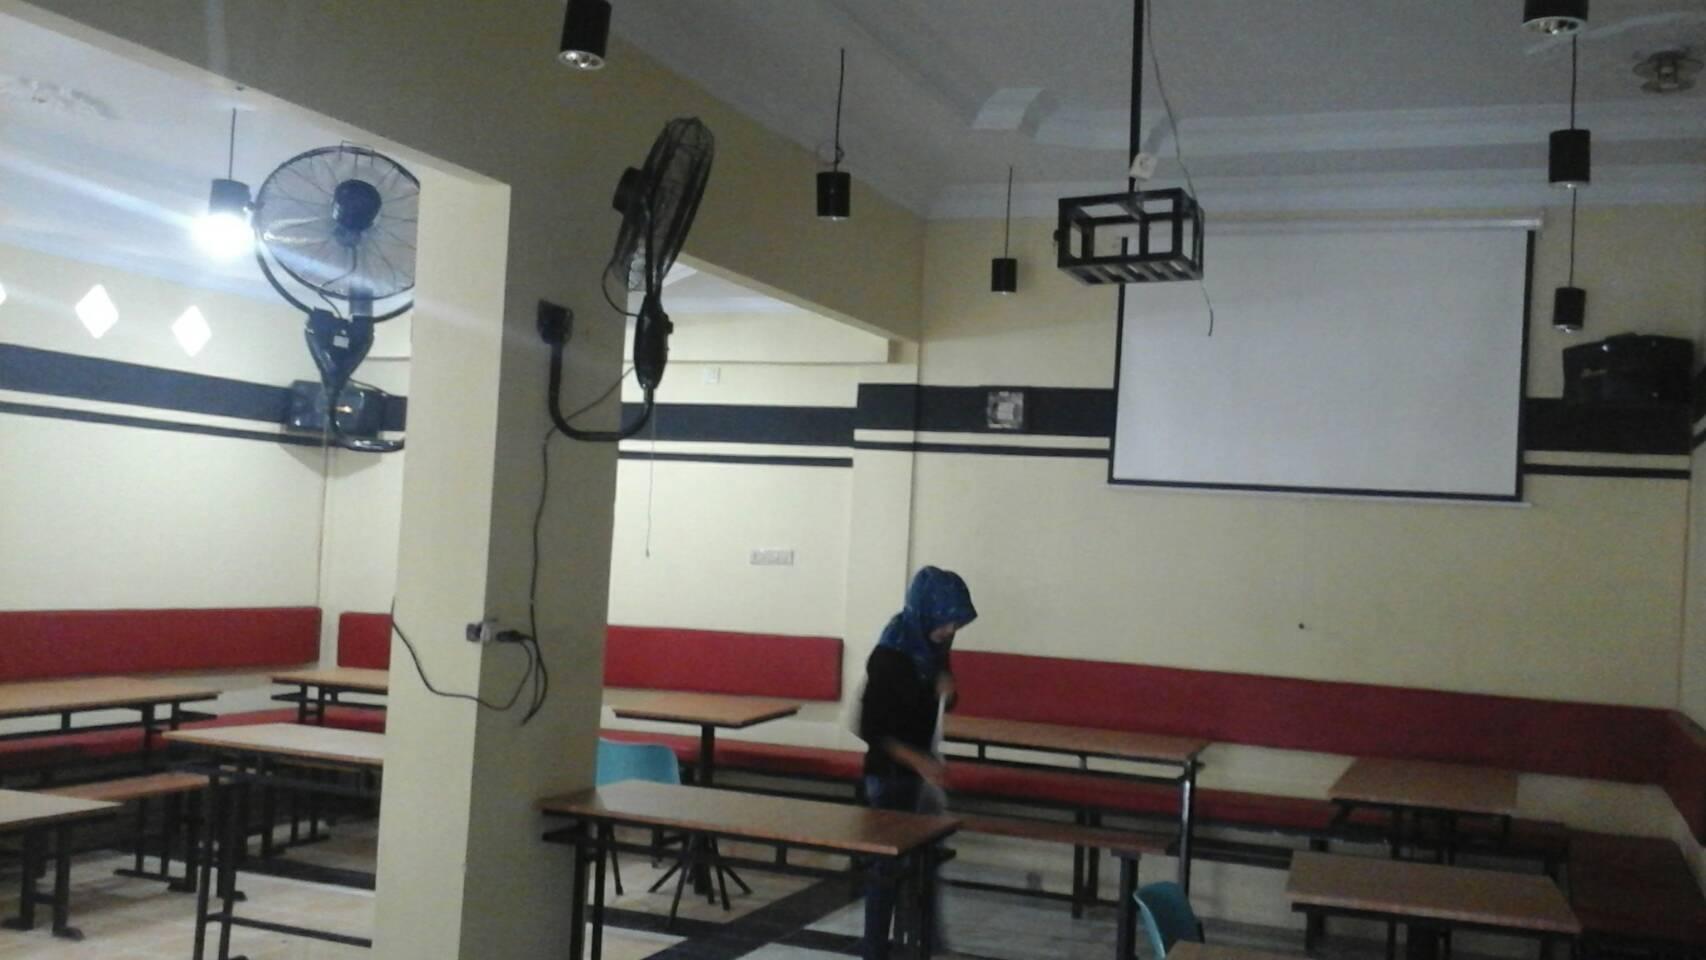 1504062130914 - Usaha Foodcourt And Coffee, Tempat Nongkrong Pekanbaru